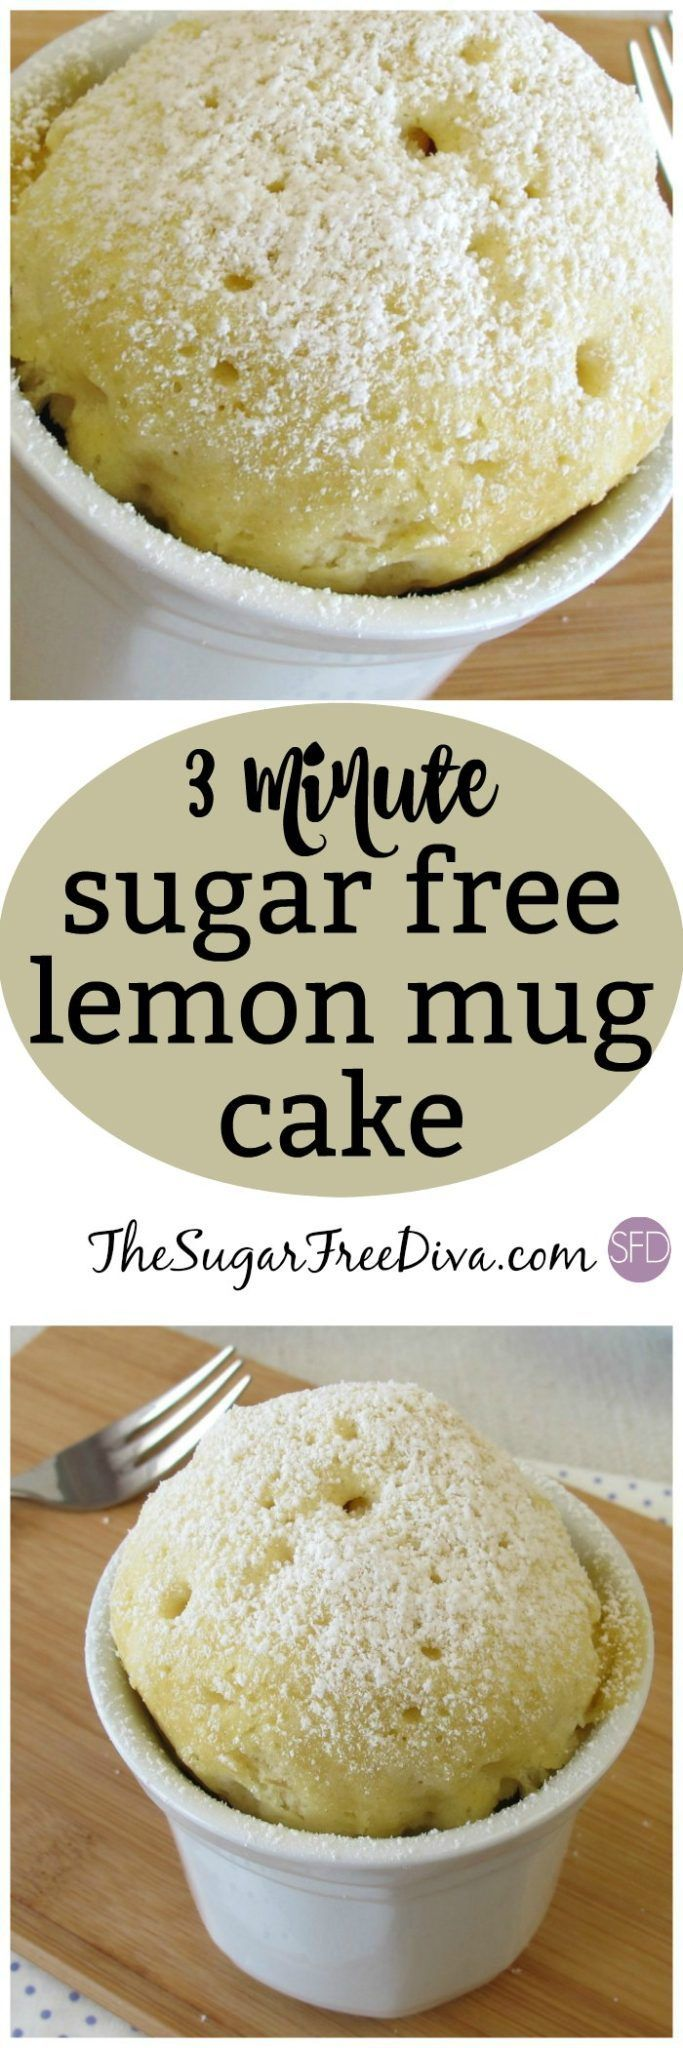 YUM! This lemon mug cake is sugar free and easy to make too! #sugarfree #cake #easy #recipe #lemon #mugcake via #sugarfree #lowcarb #dessert